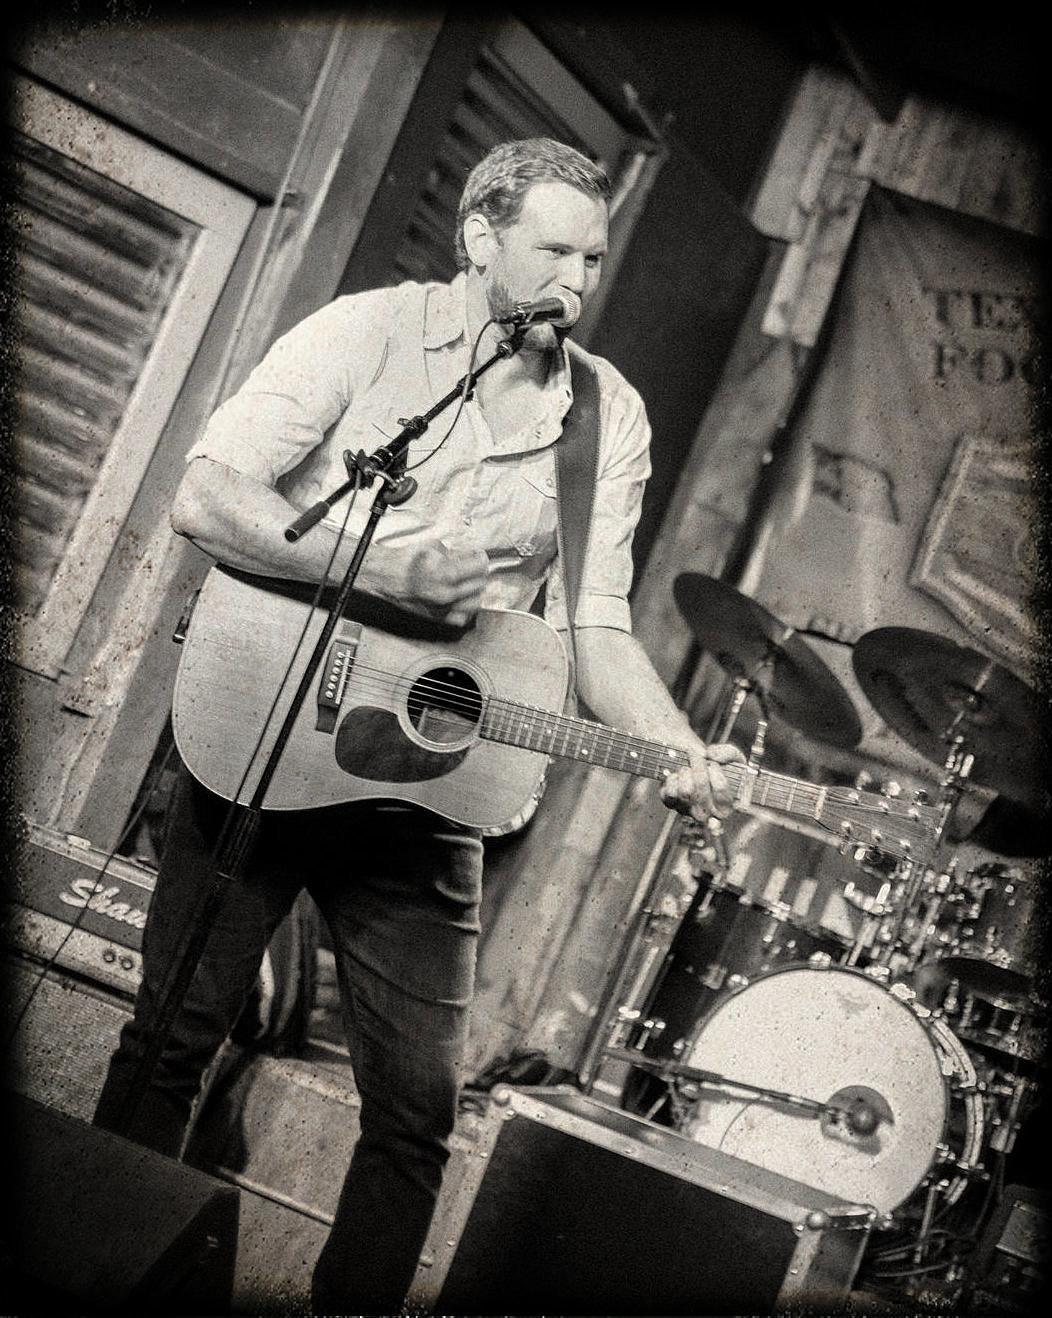 photo courtesy of https://www.blanehoward.com/music